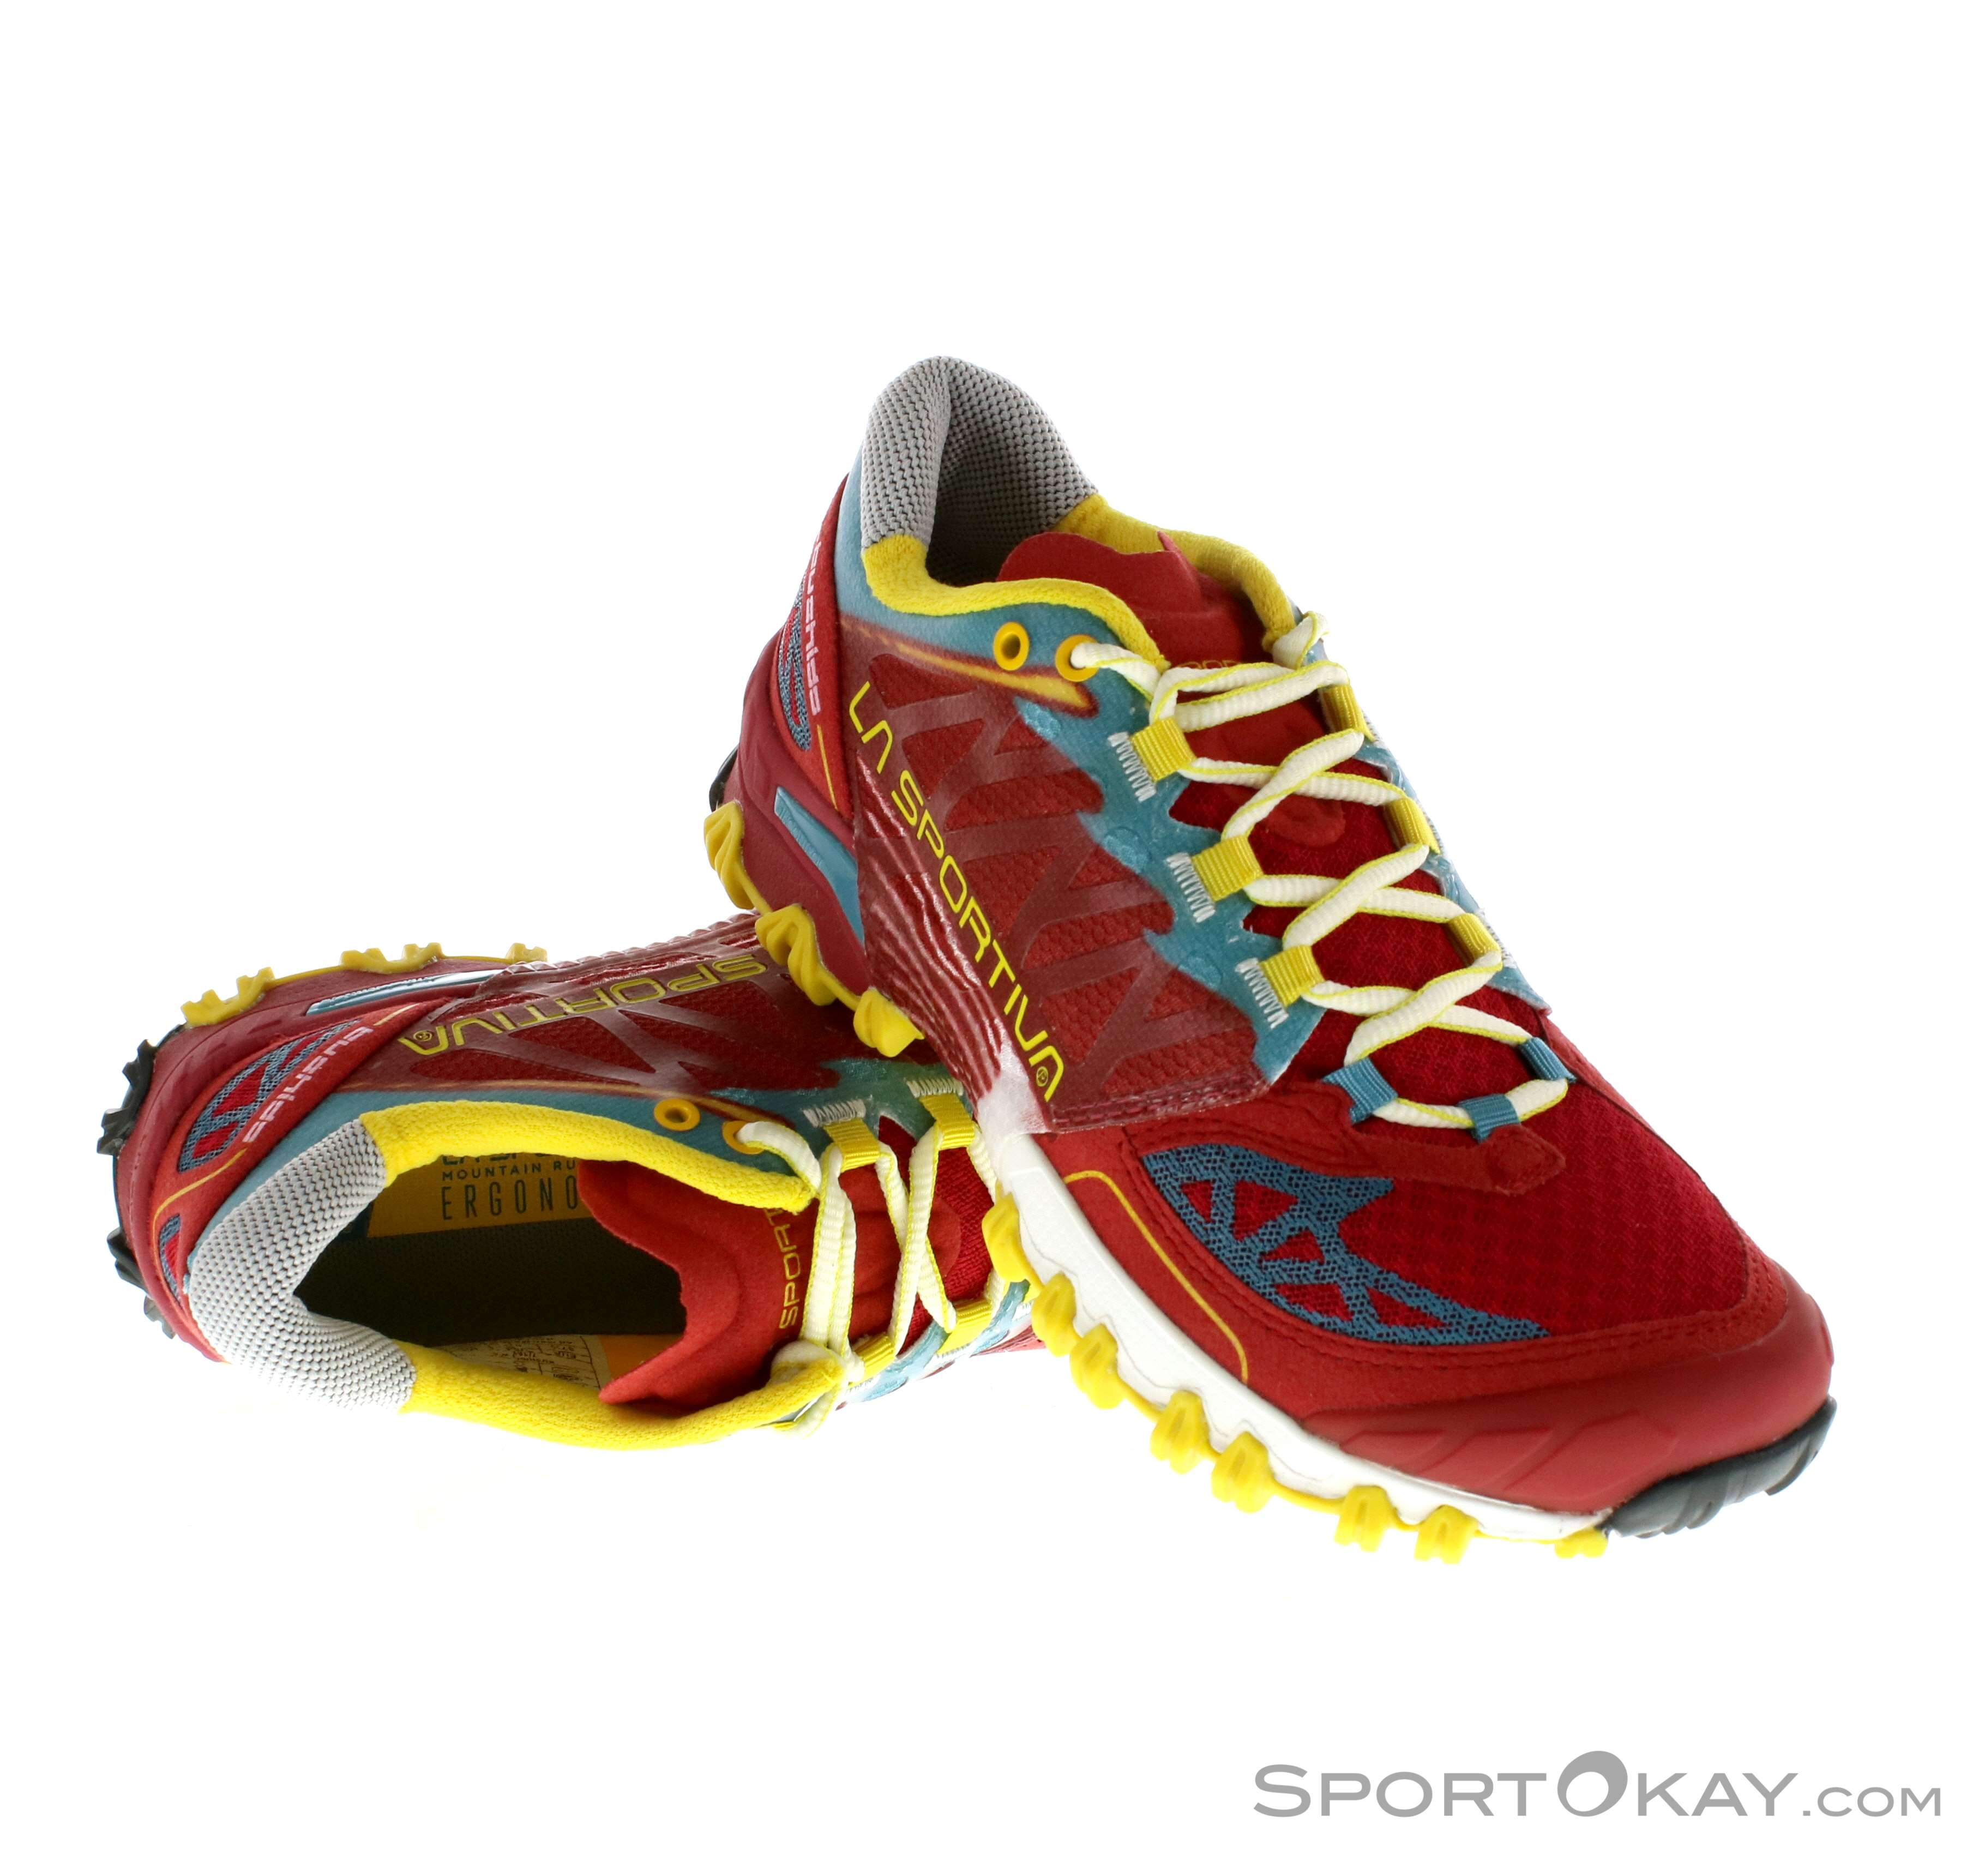 La Sportiva Bushido Damen Traillaufschuhe Traillaufschuhe 8xcEh